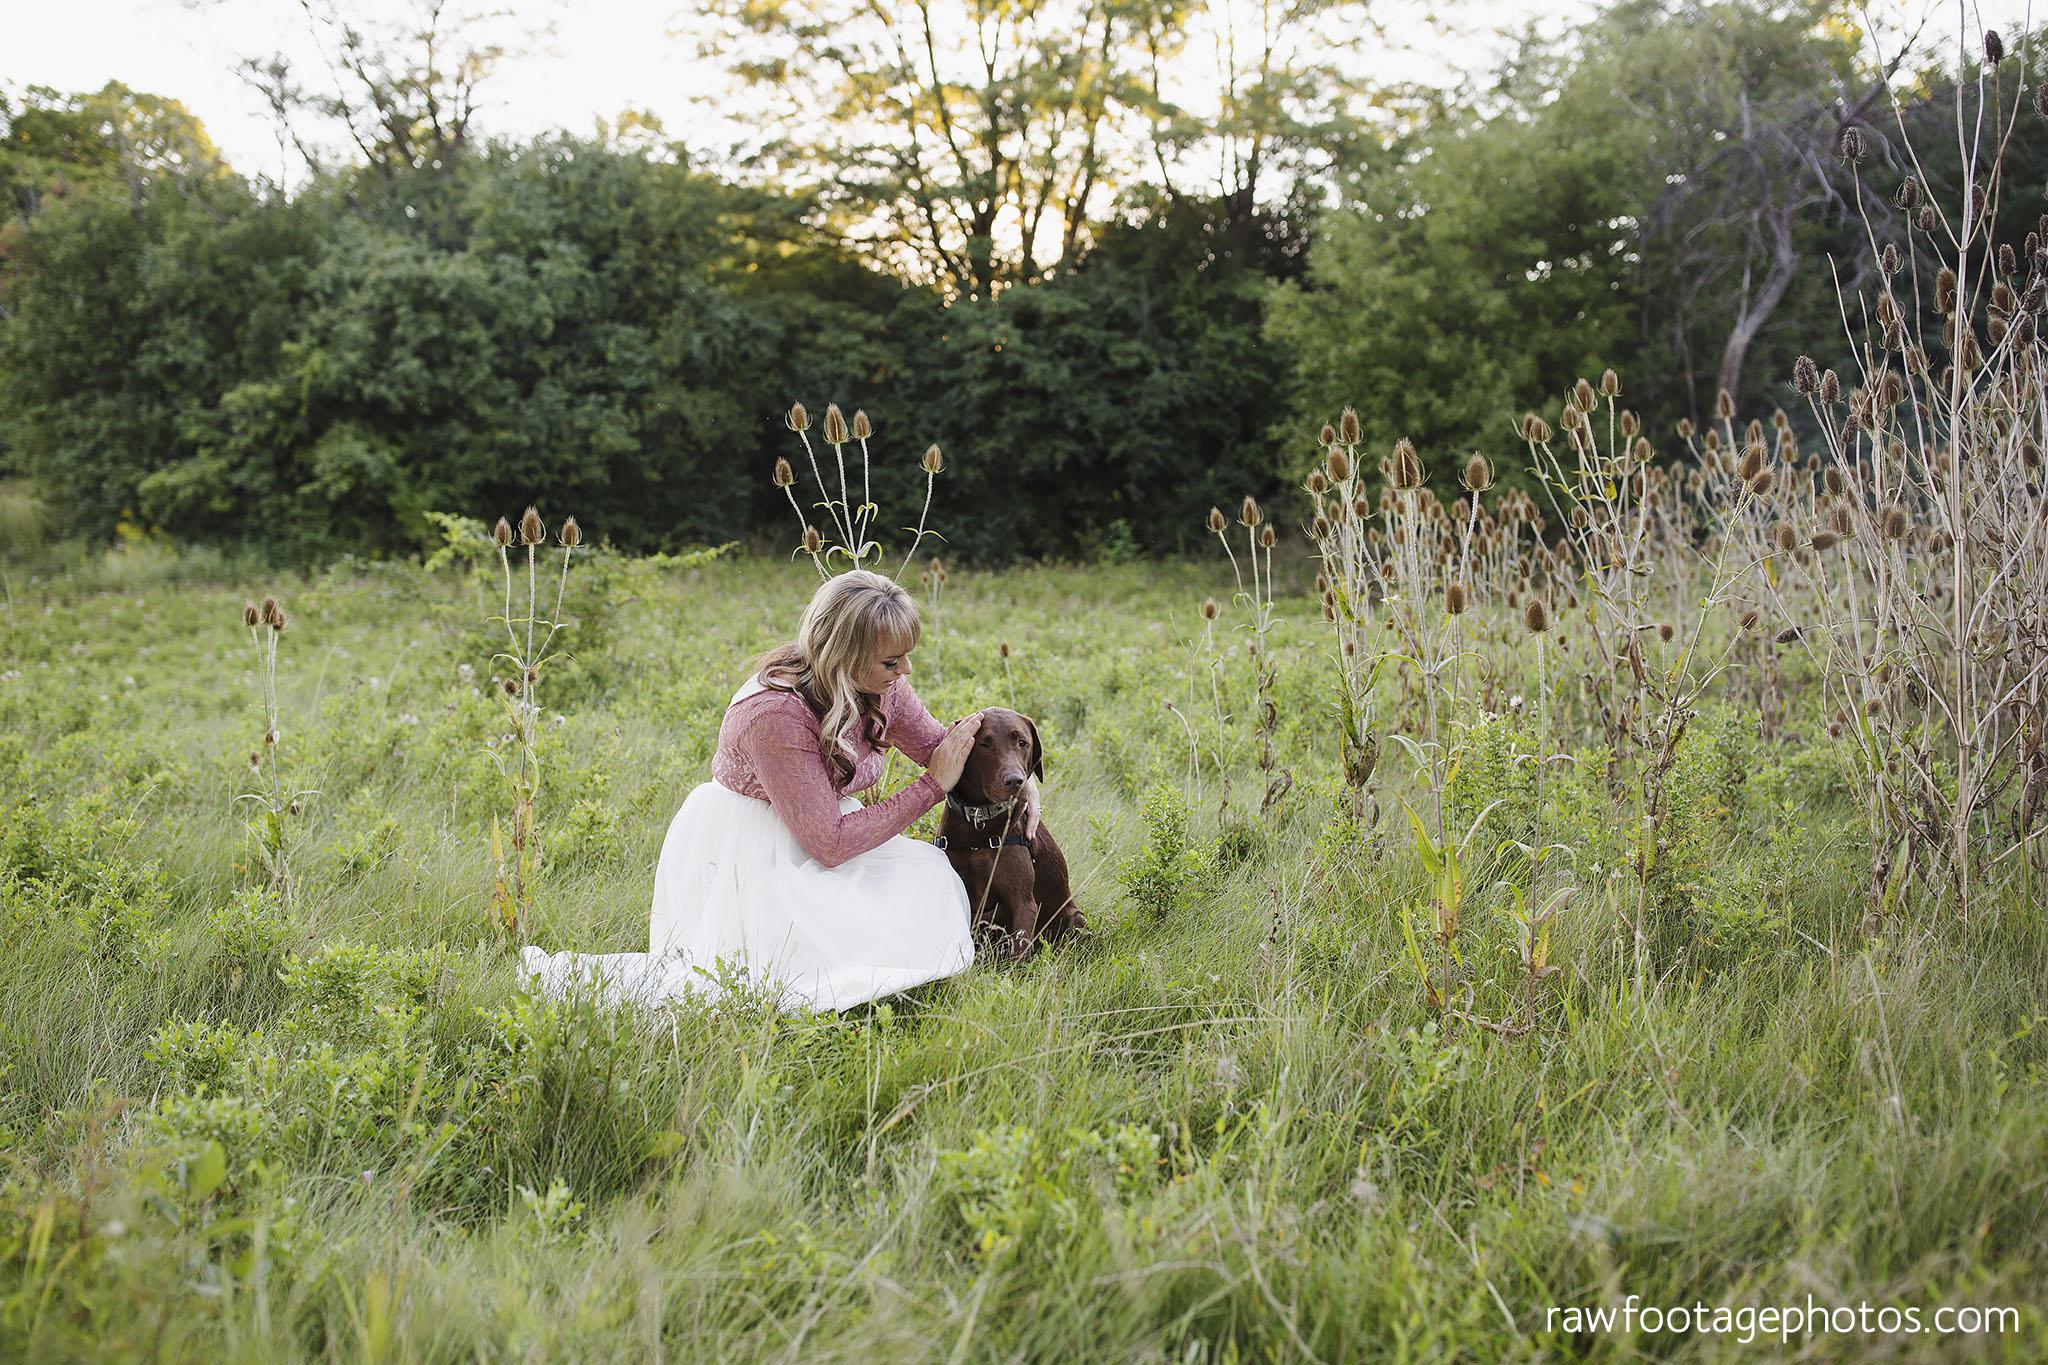 London_Ontario_Photographer-family_photography-pet_photography-lifestyle_photography016.jpg